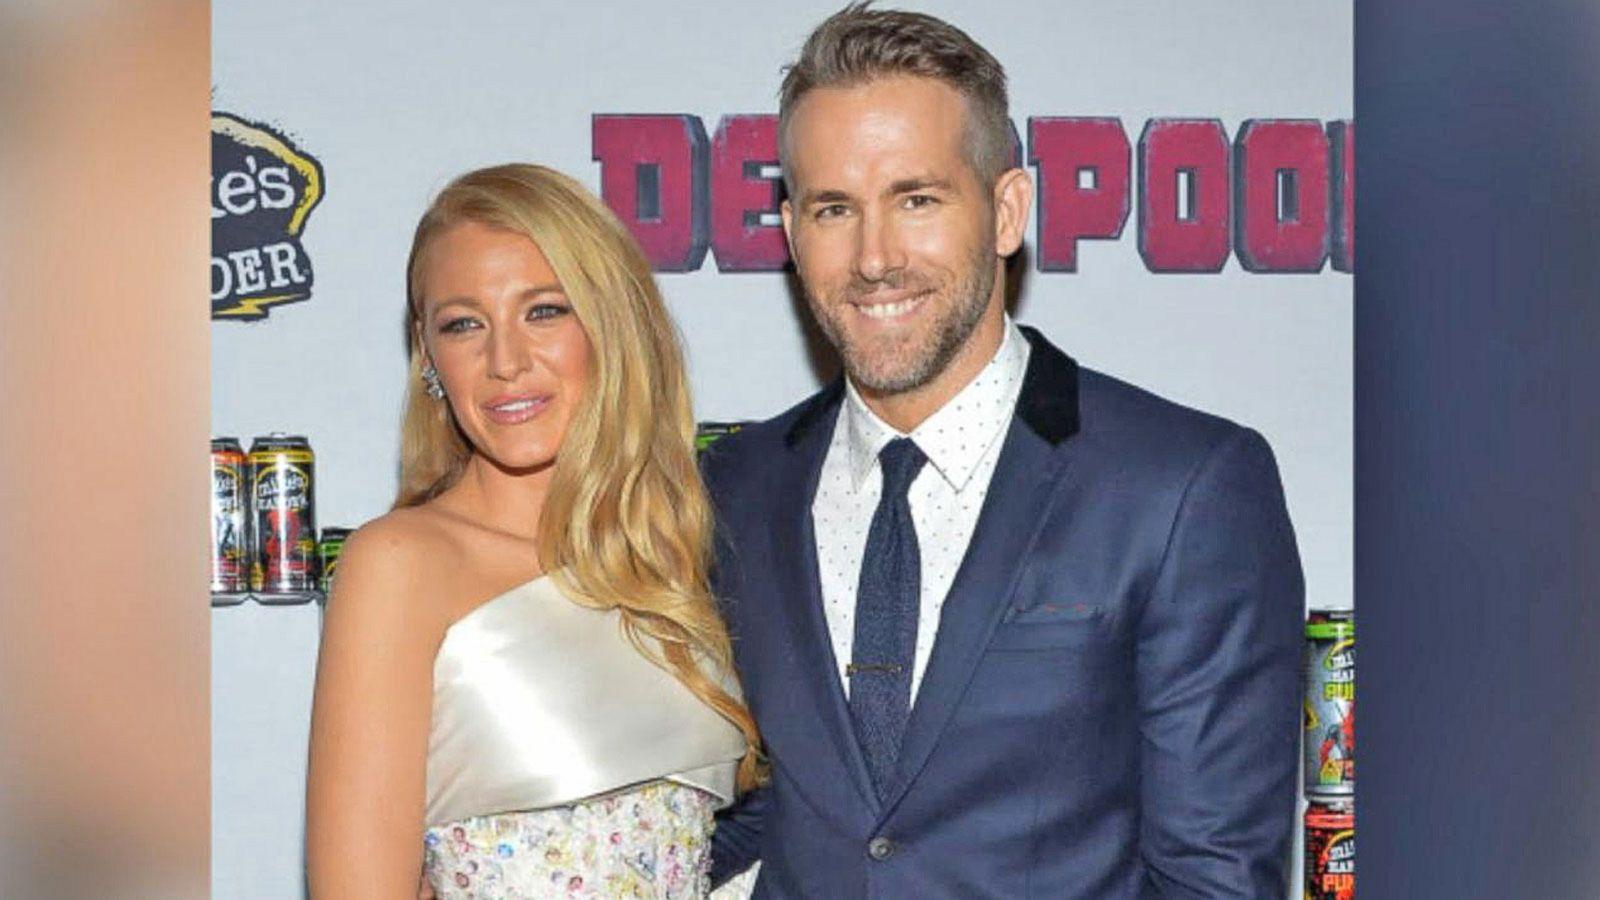 VIDEO: Blake Lively, Ryan Reynolds' 2nd Child is Born